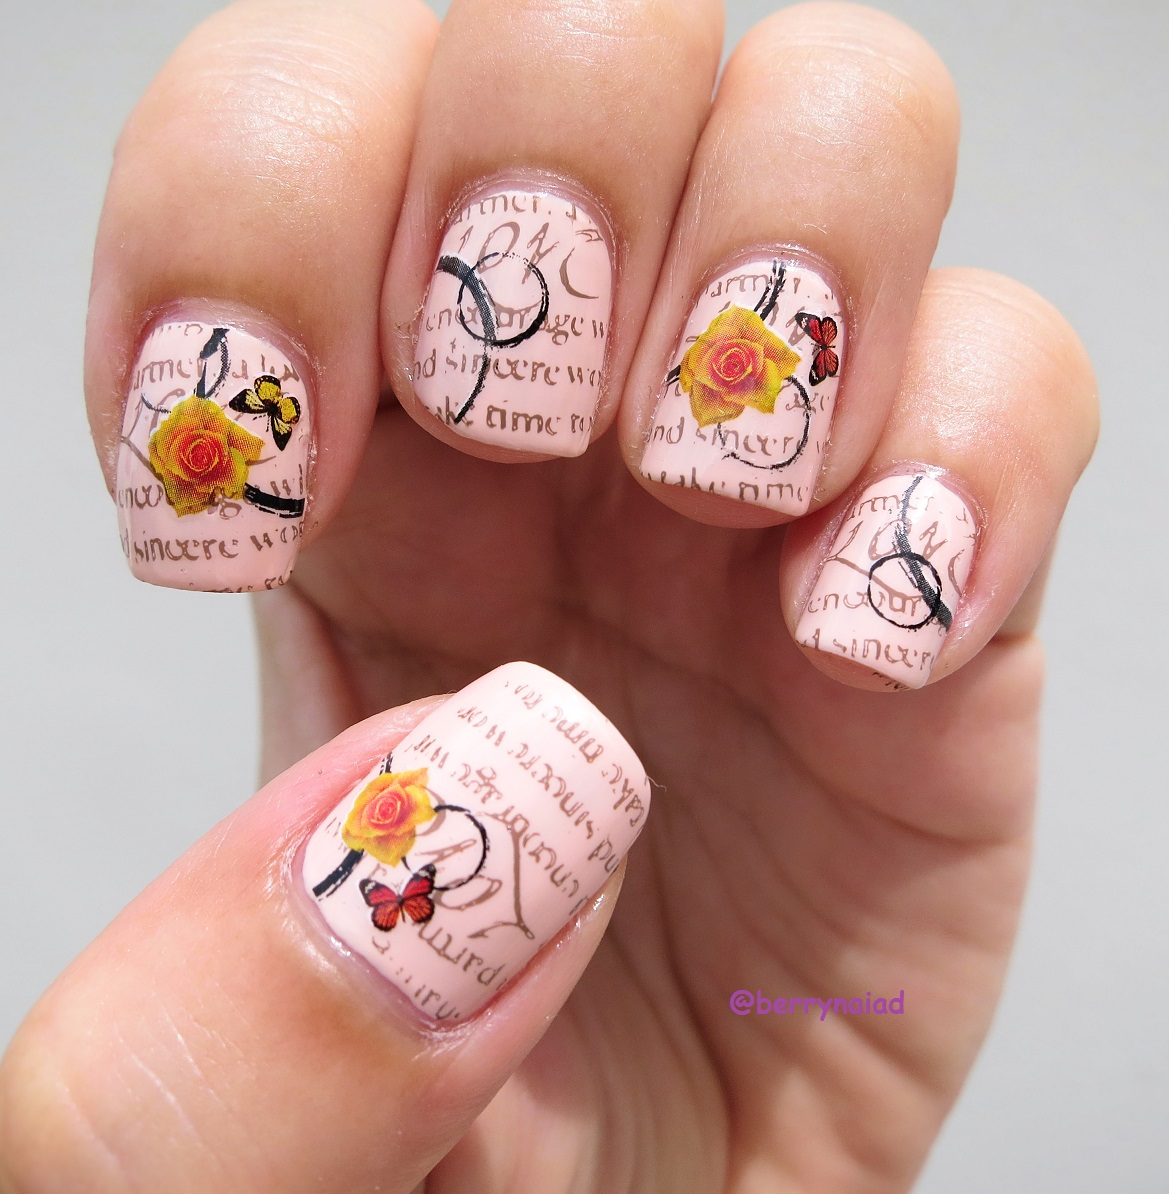 happyberrynaiad: April\'s Shabby Chic